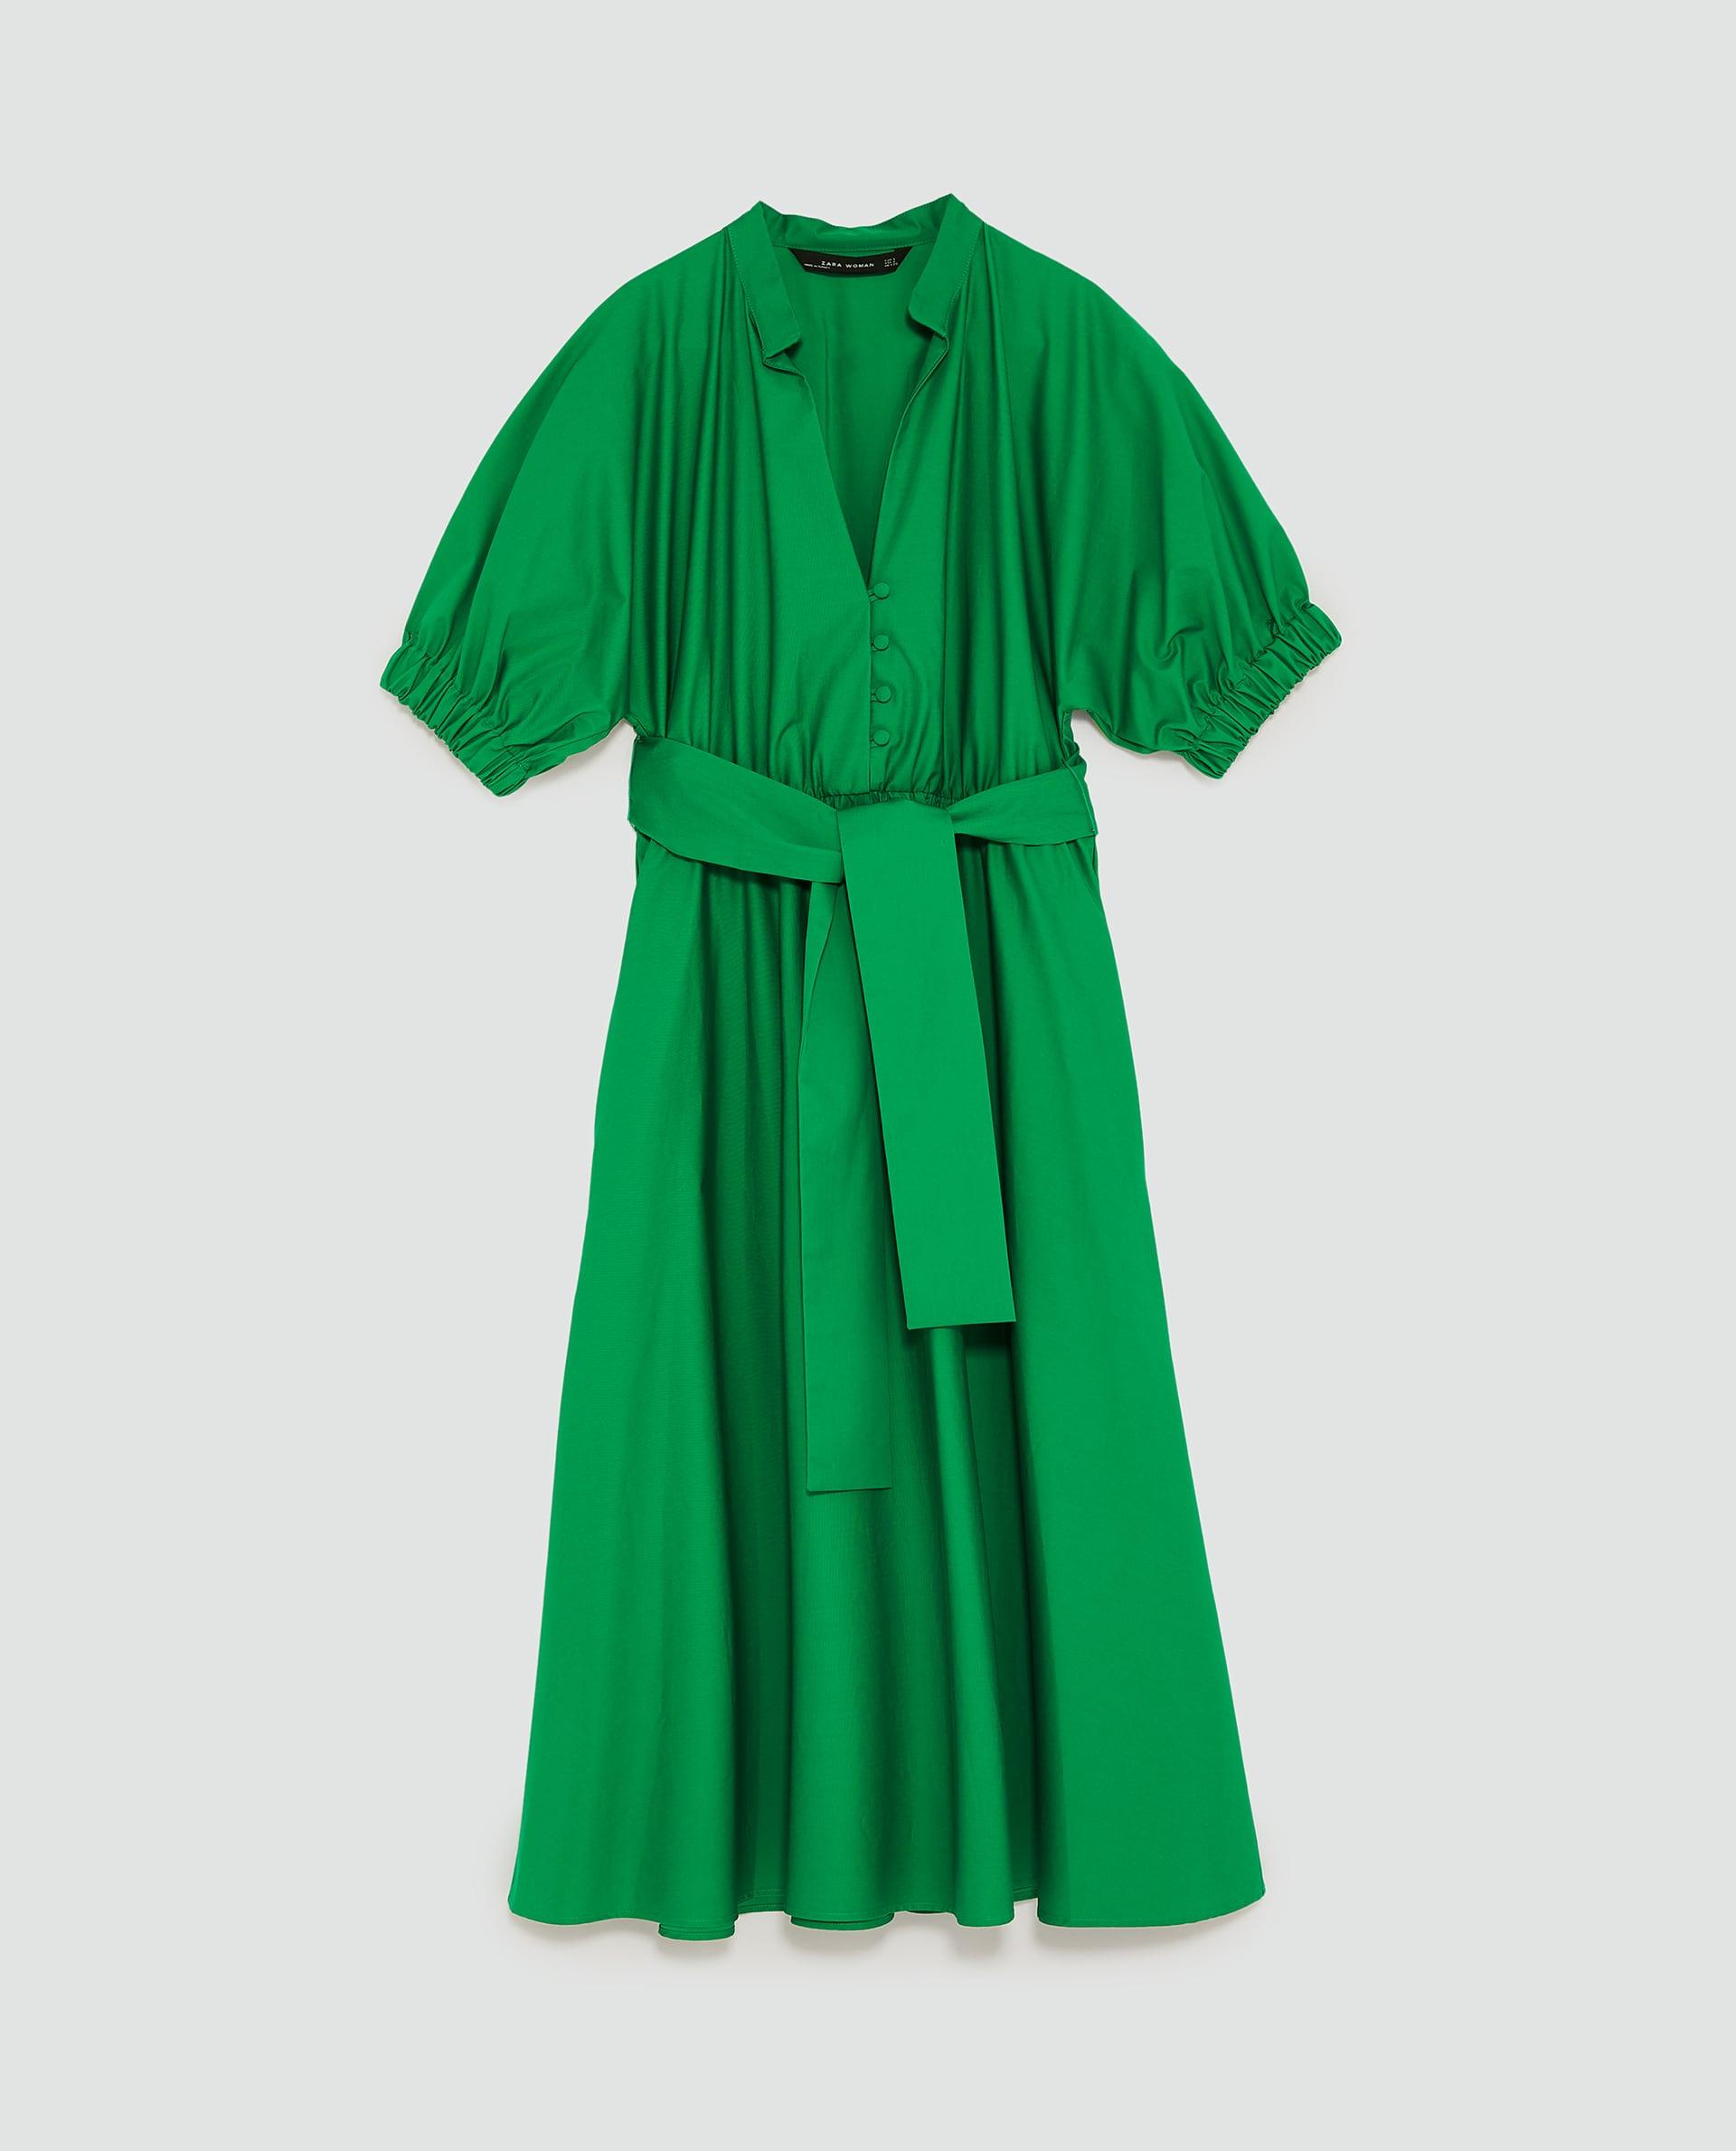 Zara Midi Dress with Voluminous Sleeves in Green.jpg